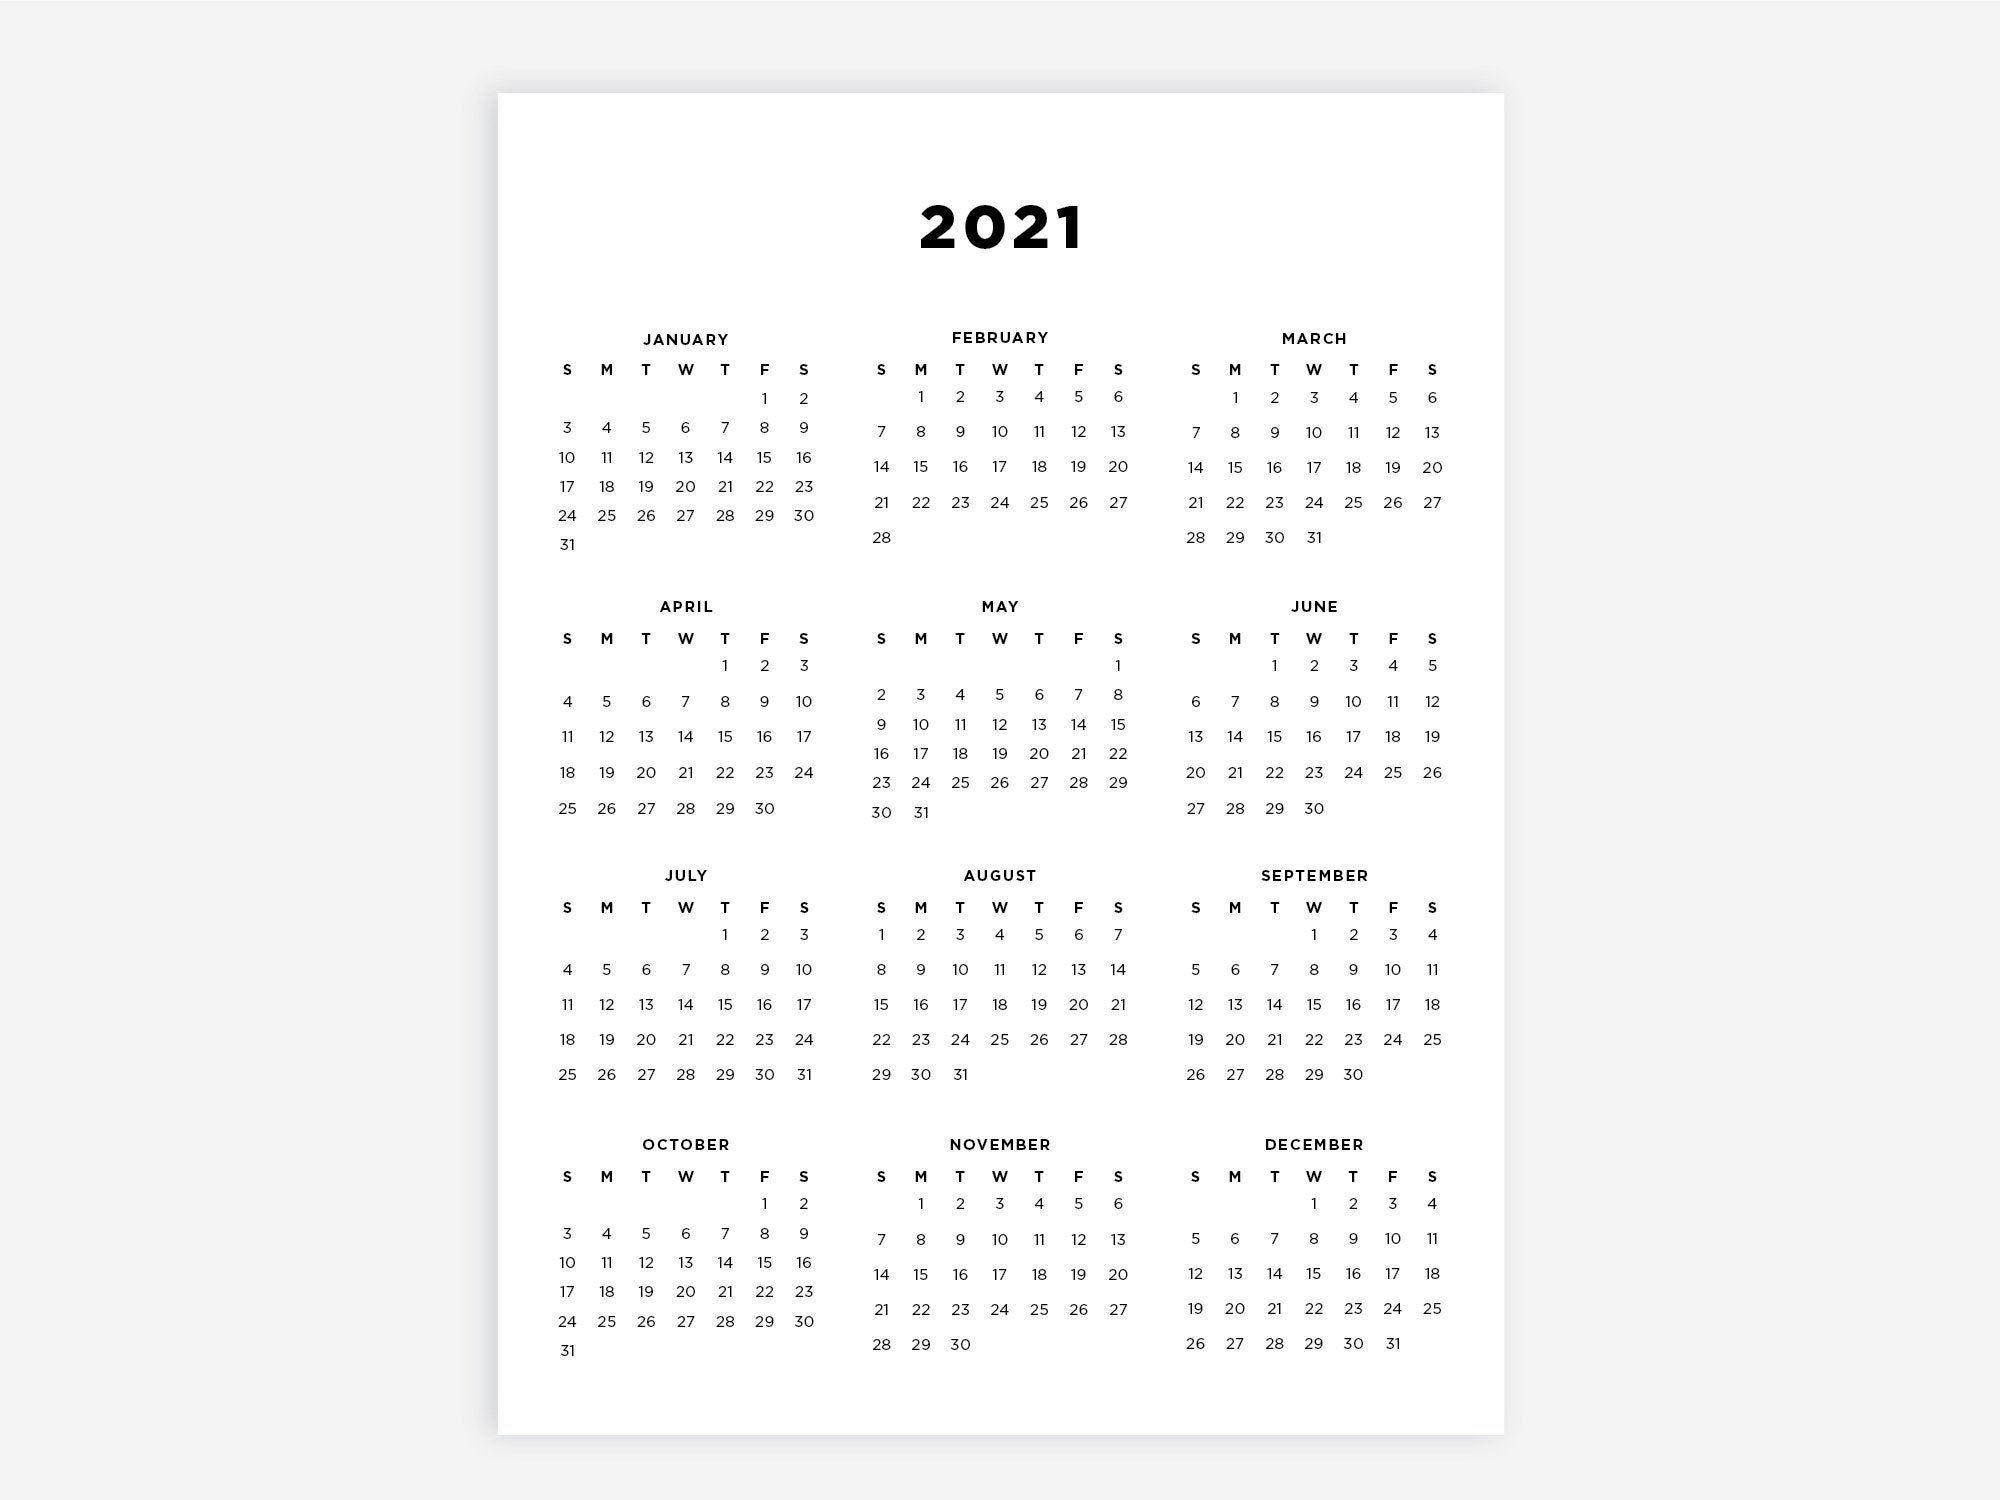 20+ Calendar 2021 Xls - Free Download Printable Calendar